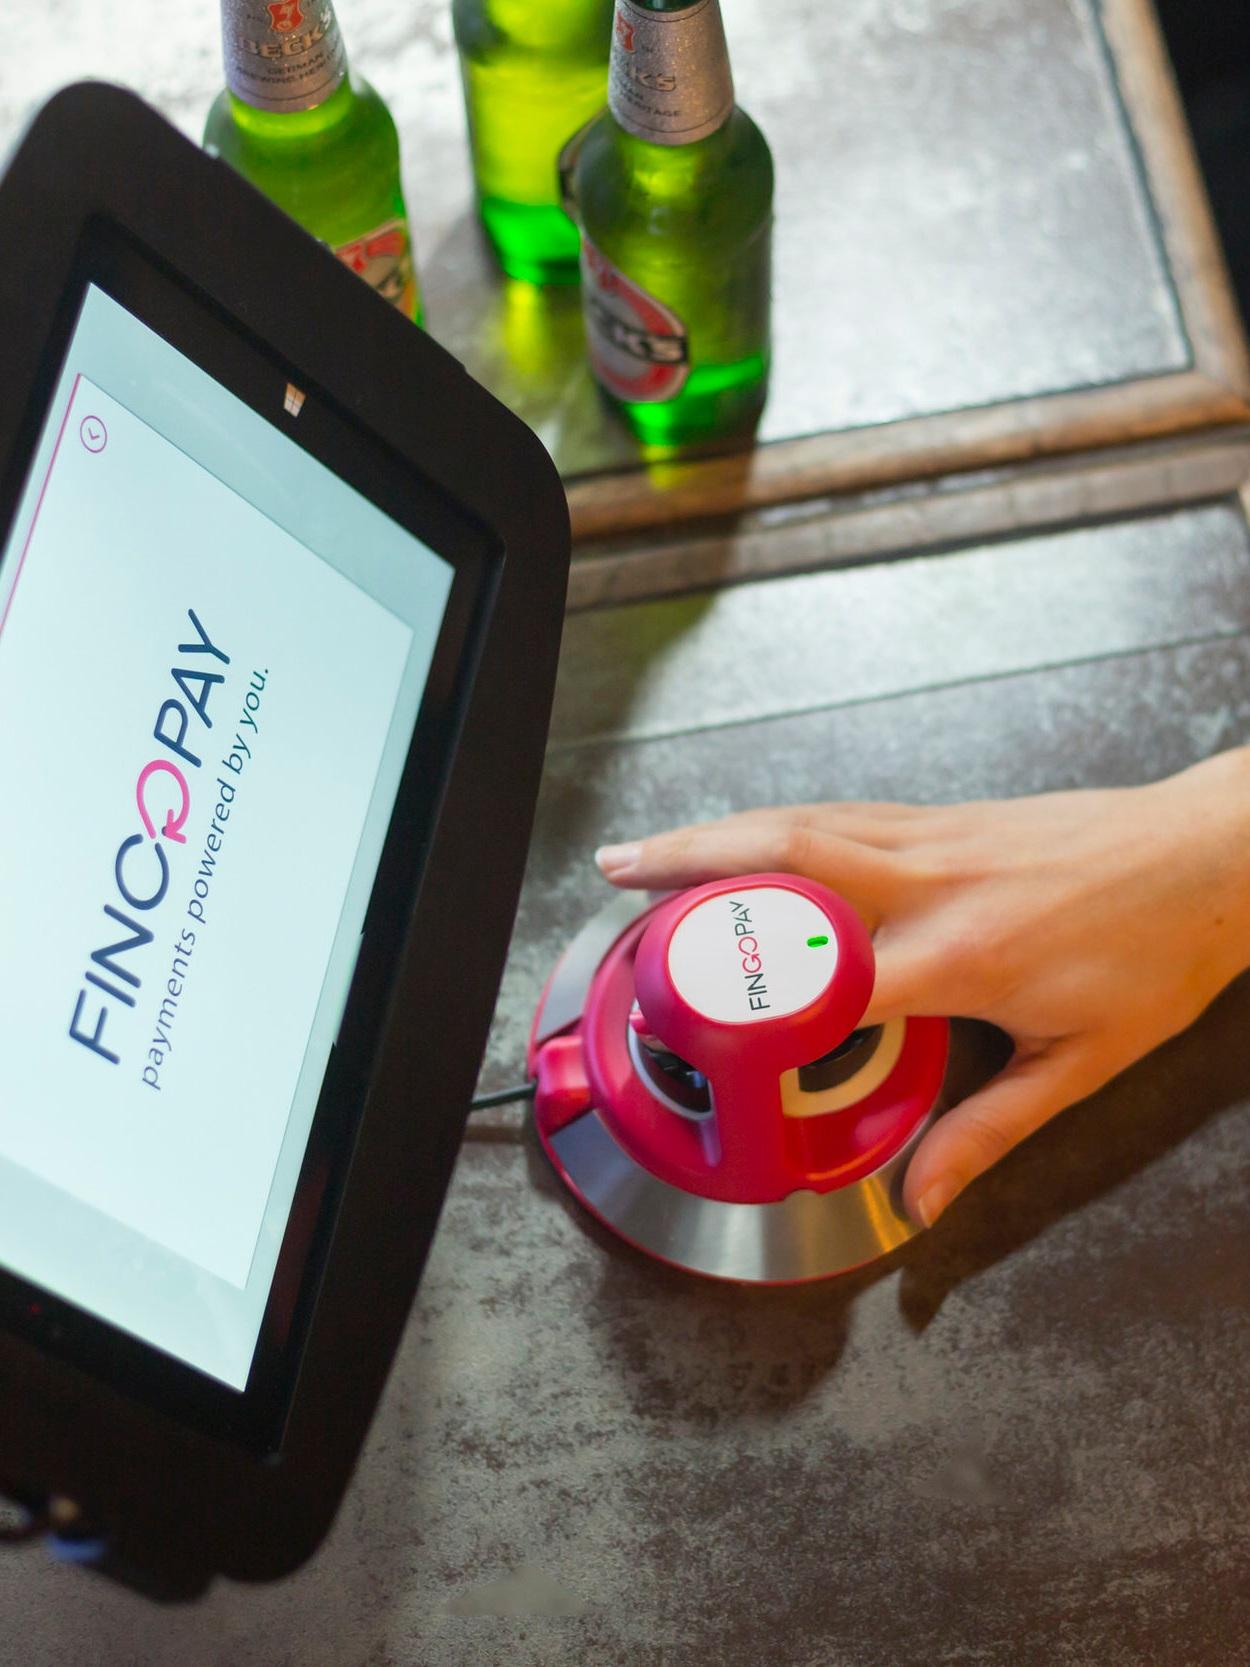 "<p><a href=""/fingopay"">Biometrics Payment Proof of Concept</a>STAHLER</p>"